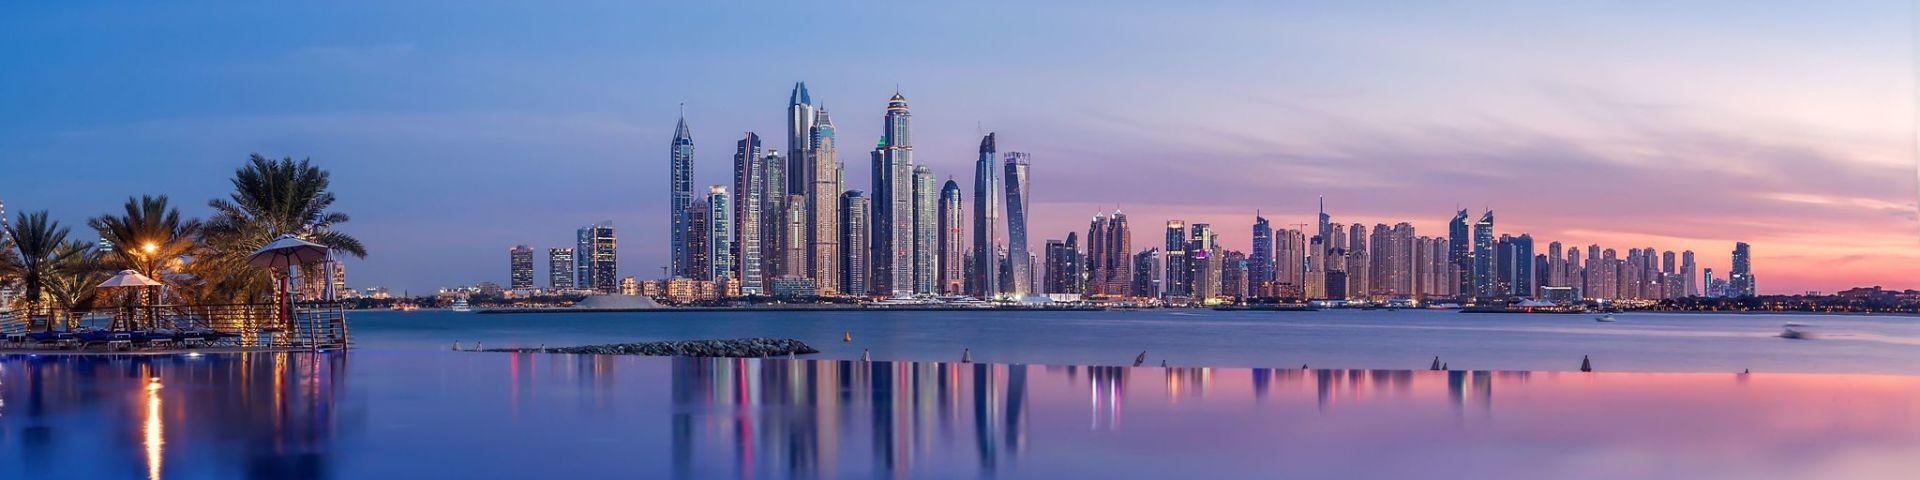 Faszination Dubai